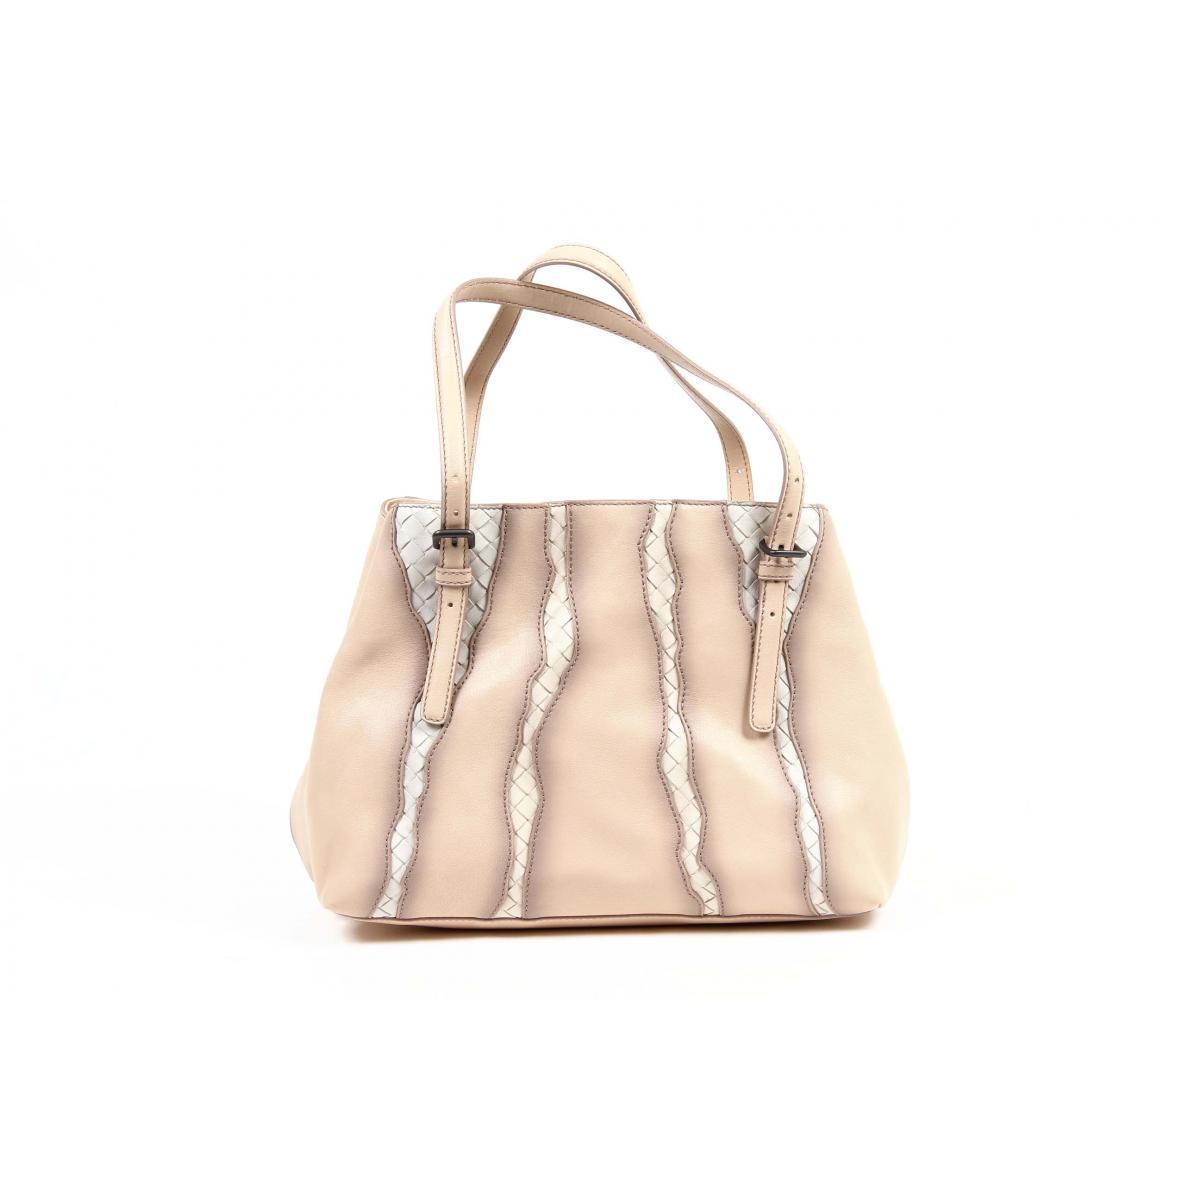 d4cb48beed37 Bottega Veneta Womens Handbag 337260 VAPY1 8795 - $2,428.61